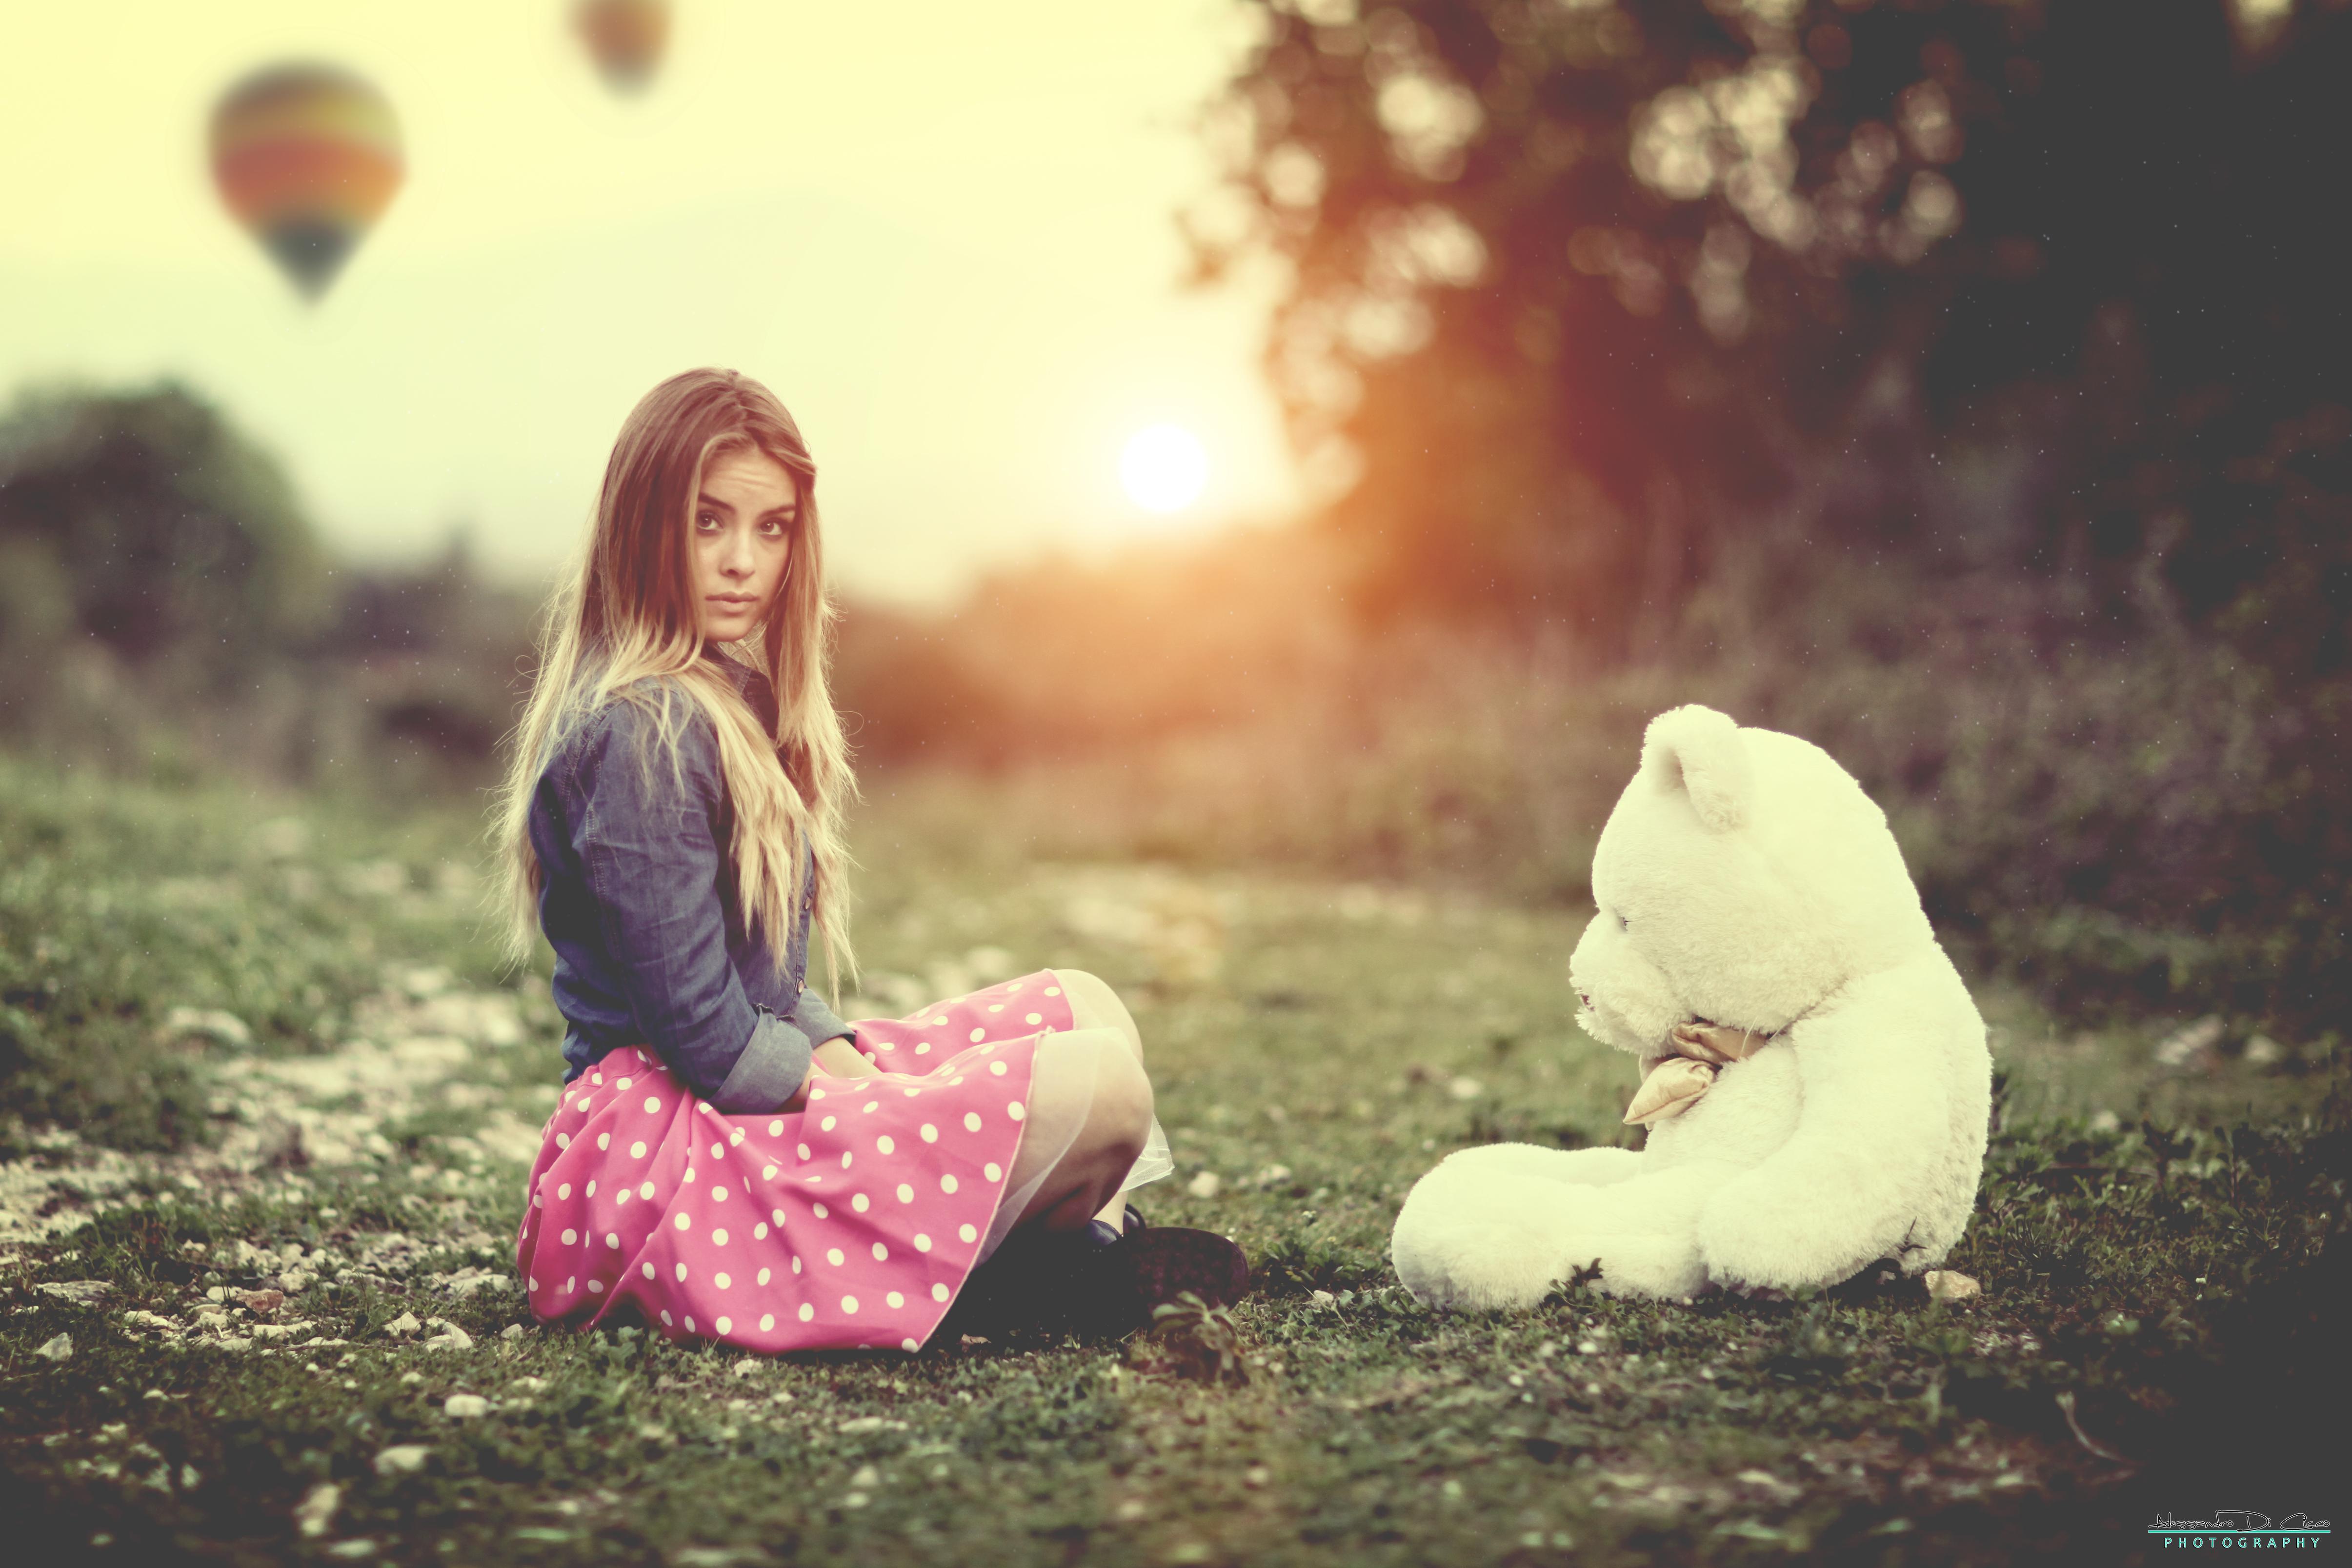 Blonde Blur Model Teddy Bear Woman 4821x3214